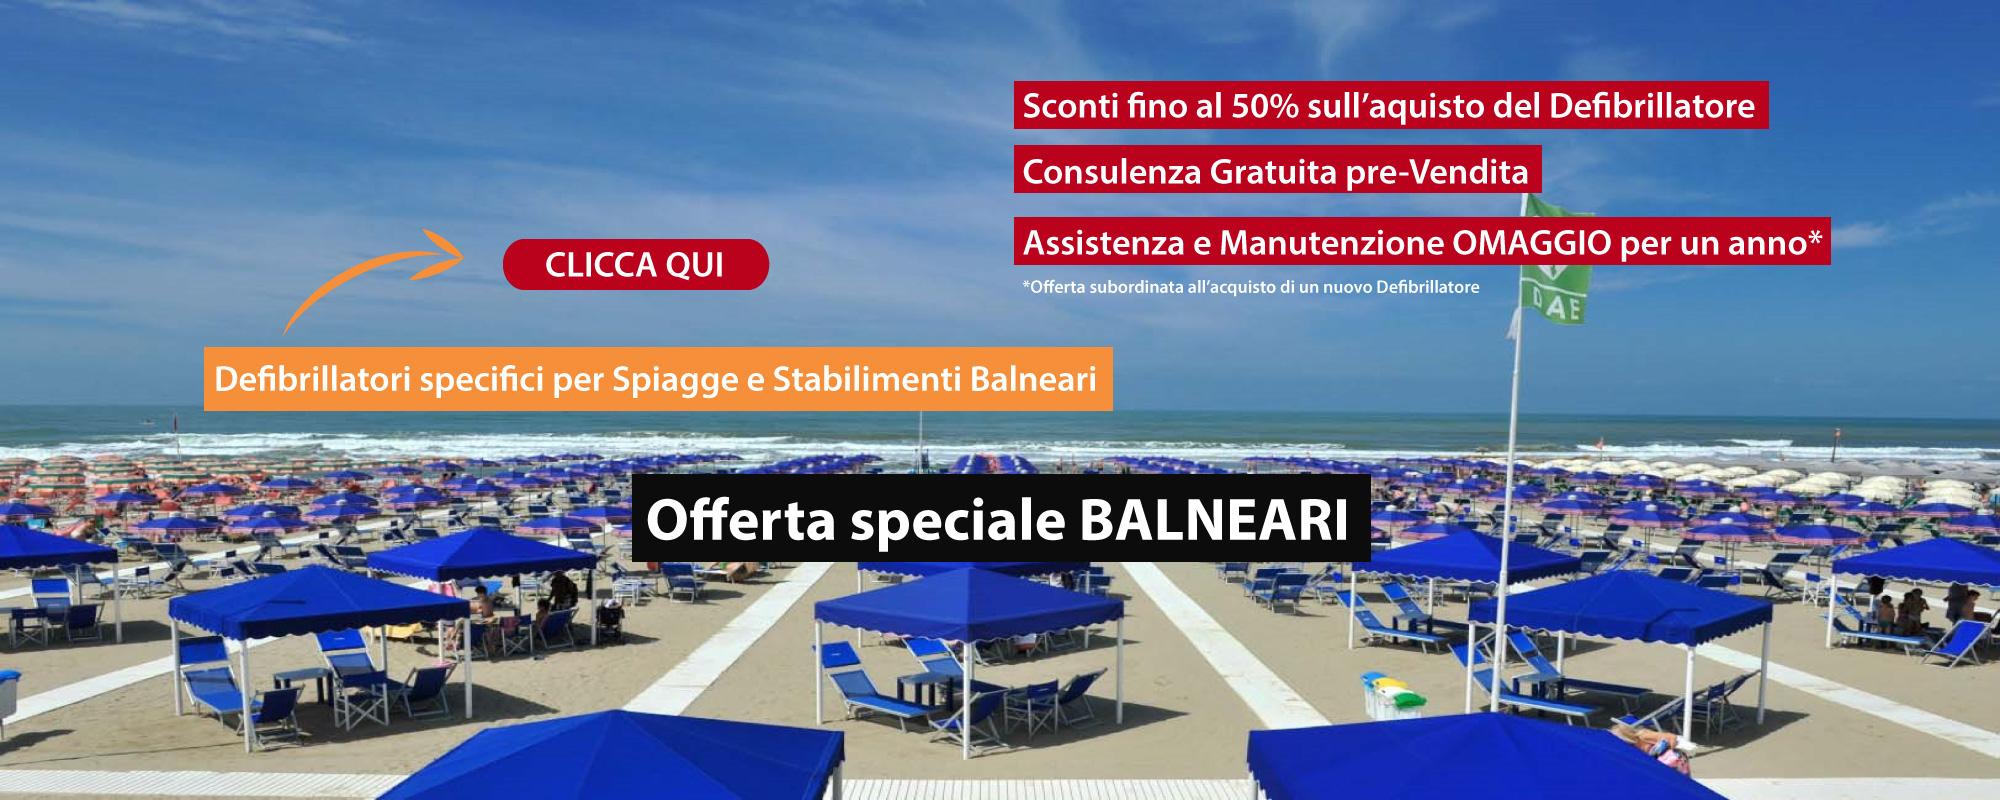 assistenza-manutenzione-gratis-stabilimenti-balneari